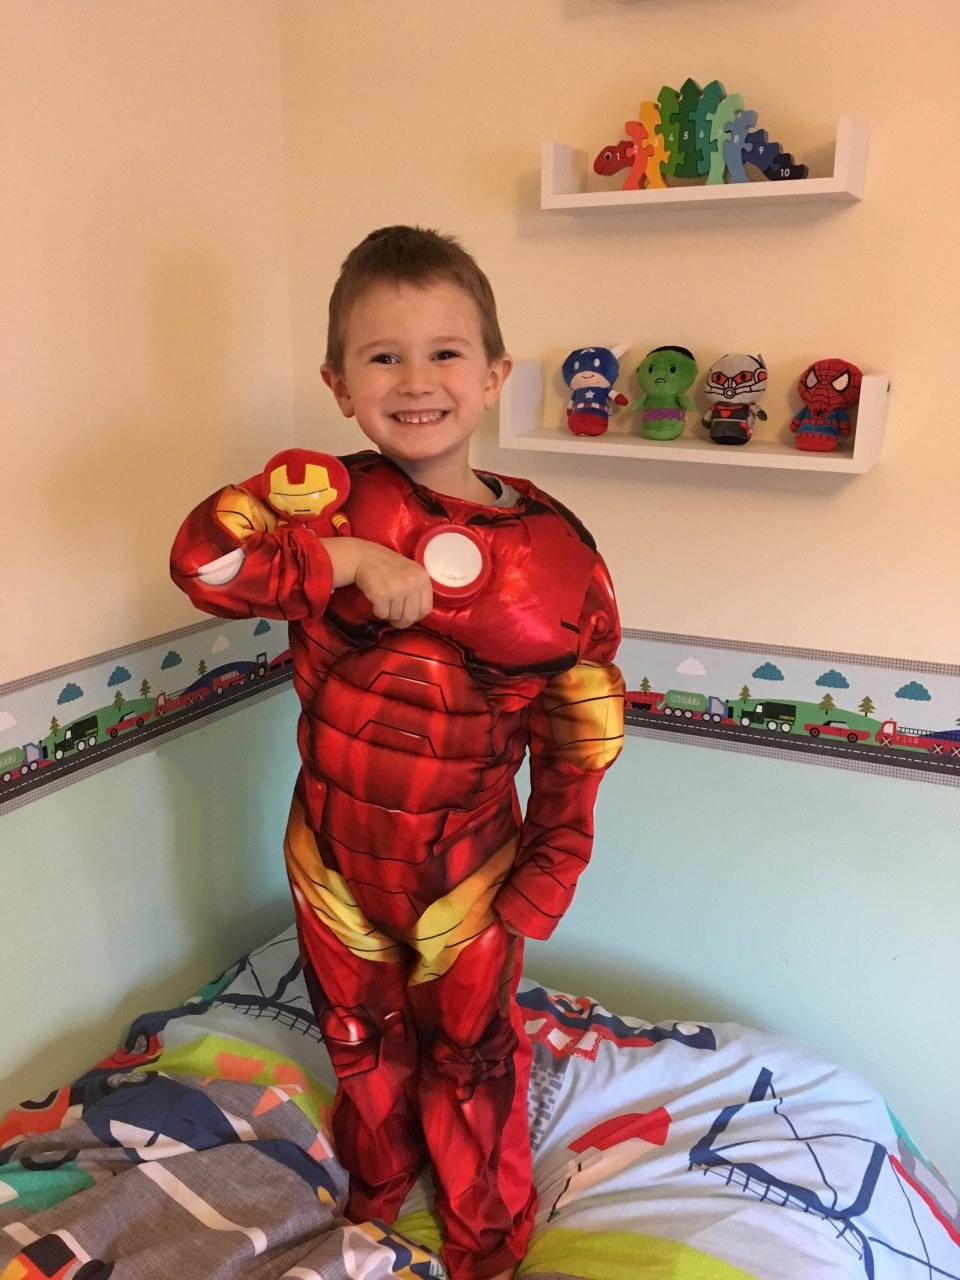 boy dressed as Iron Man